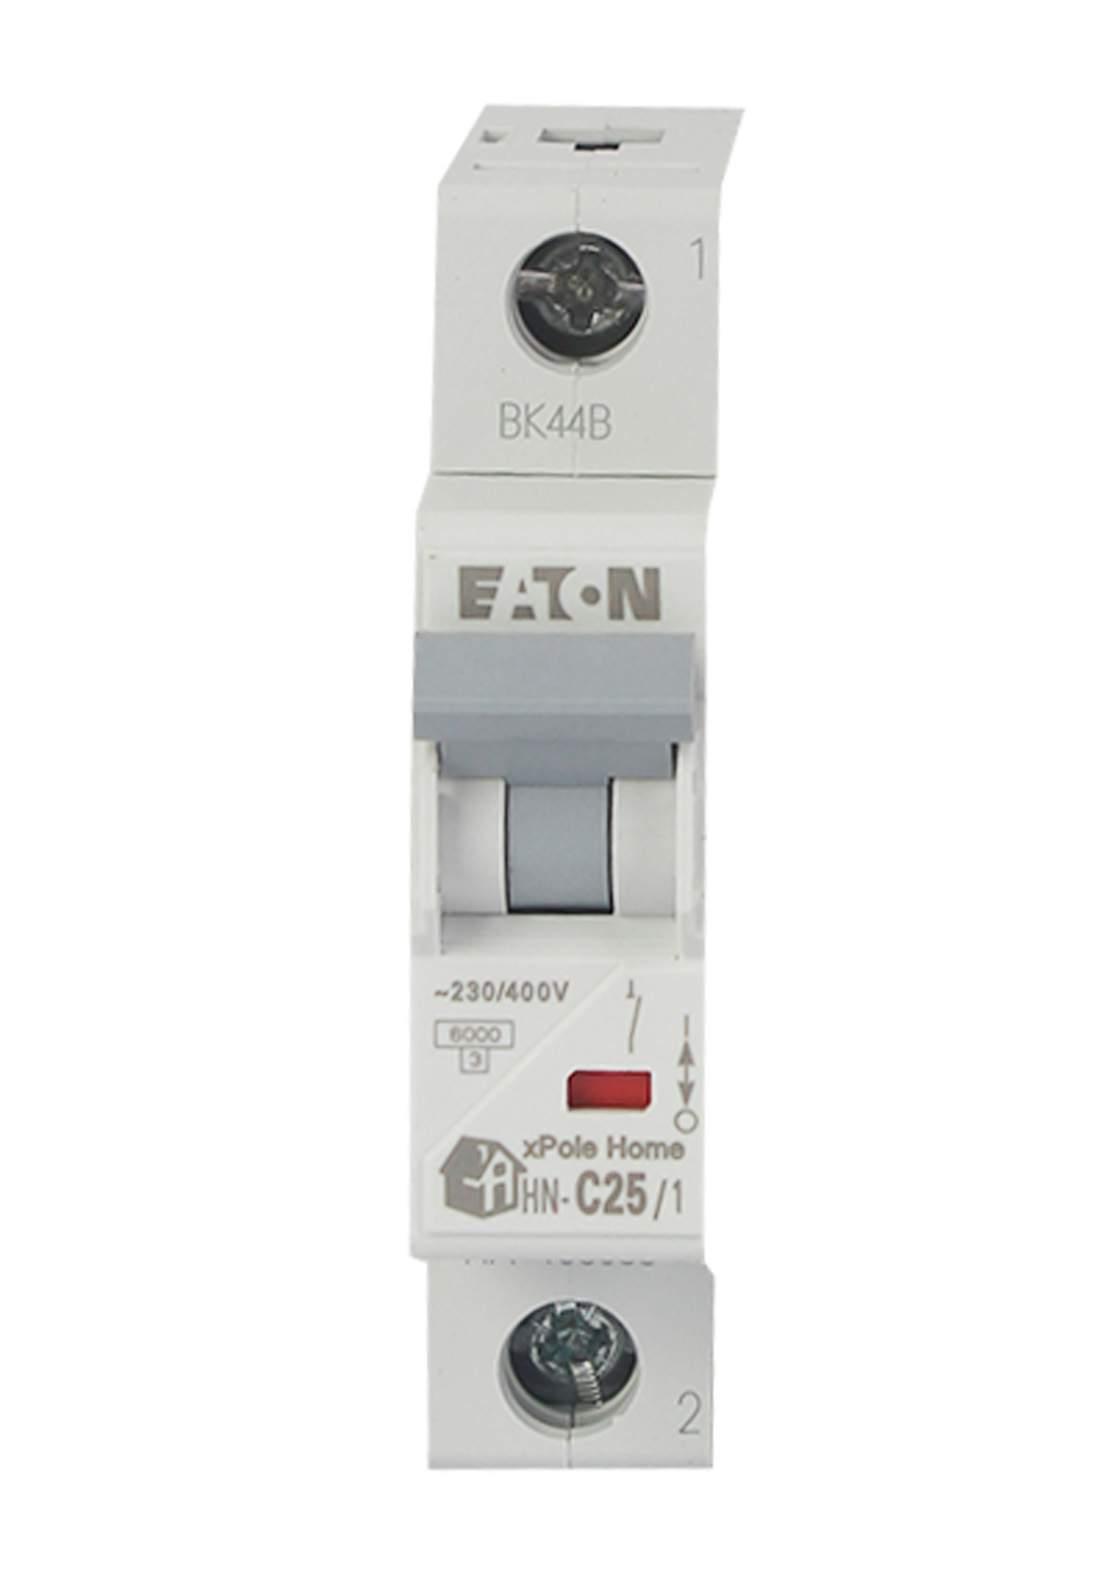 Eaton HN-C25/1-HX Circuit Breaker 25A قاطع تيار الكهرباء (جوزة)